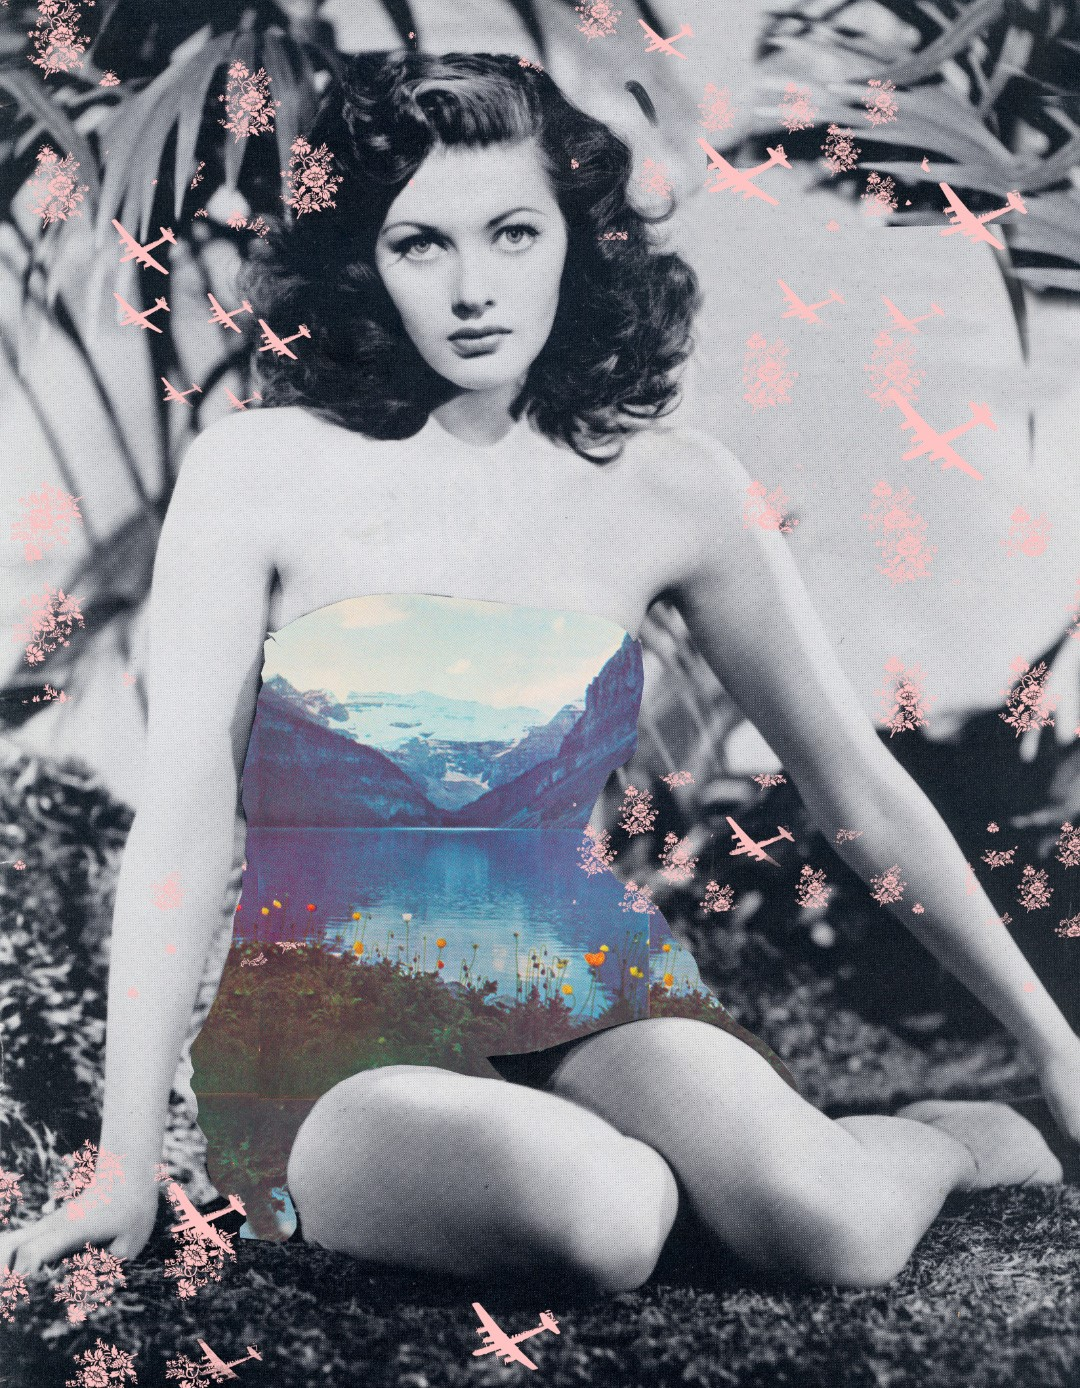 ROMAN FINE ART, Lizzie Gill, Echo Boom, 2019, Image transfer and acrylic on wood panel, 40x35in.jpg